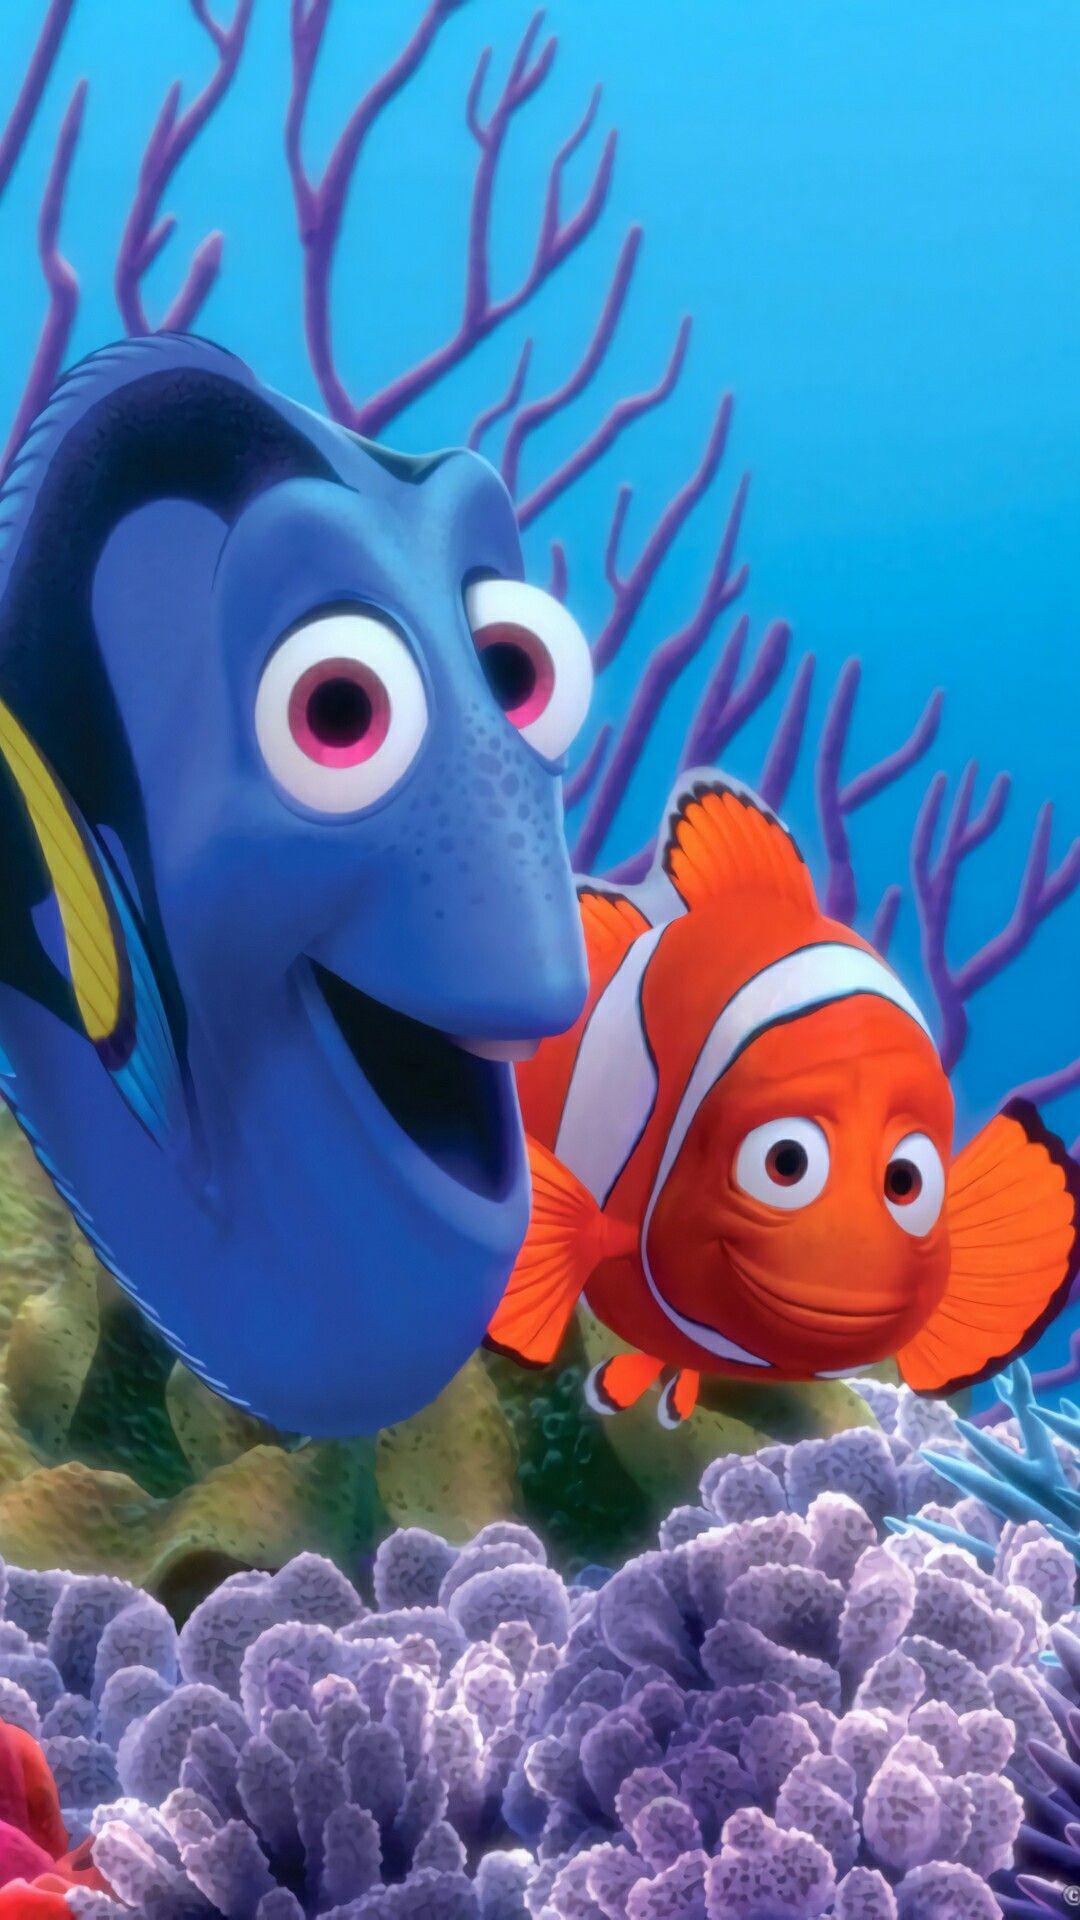 Idea by Jason Baker on Wallpapers | Disney duos  Walt Disney Pictures Presents A Pixar Animation Studios Film Finding Nemo